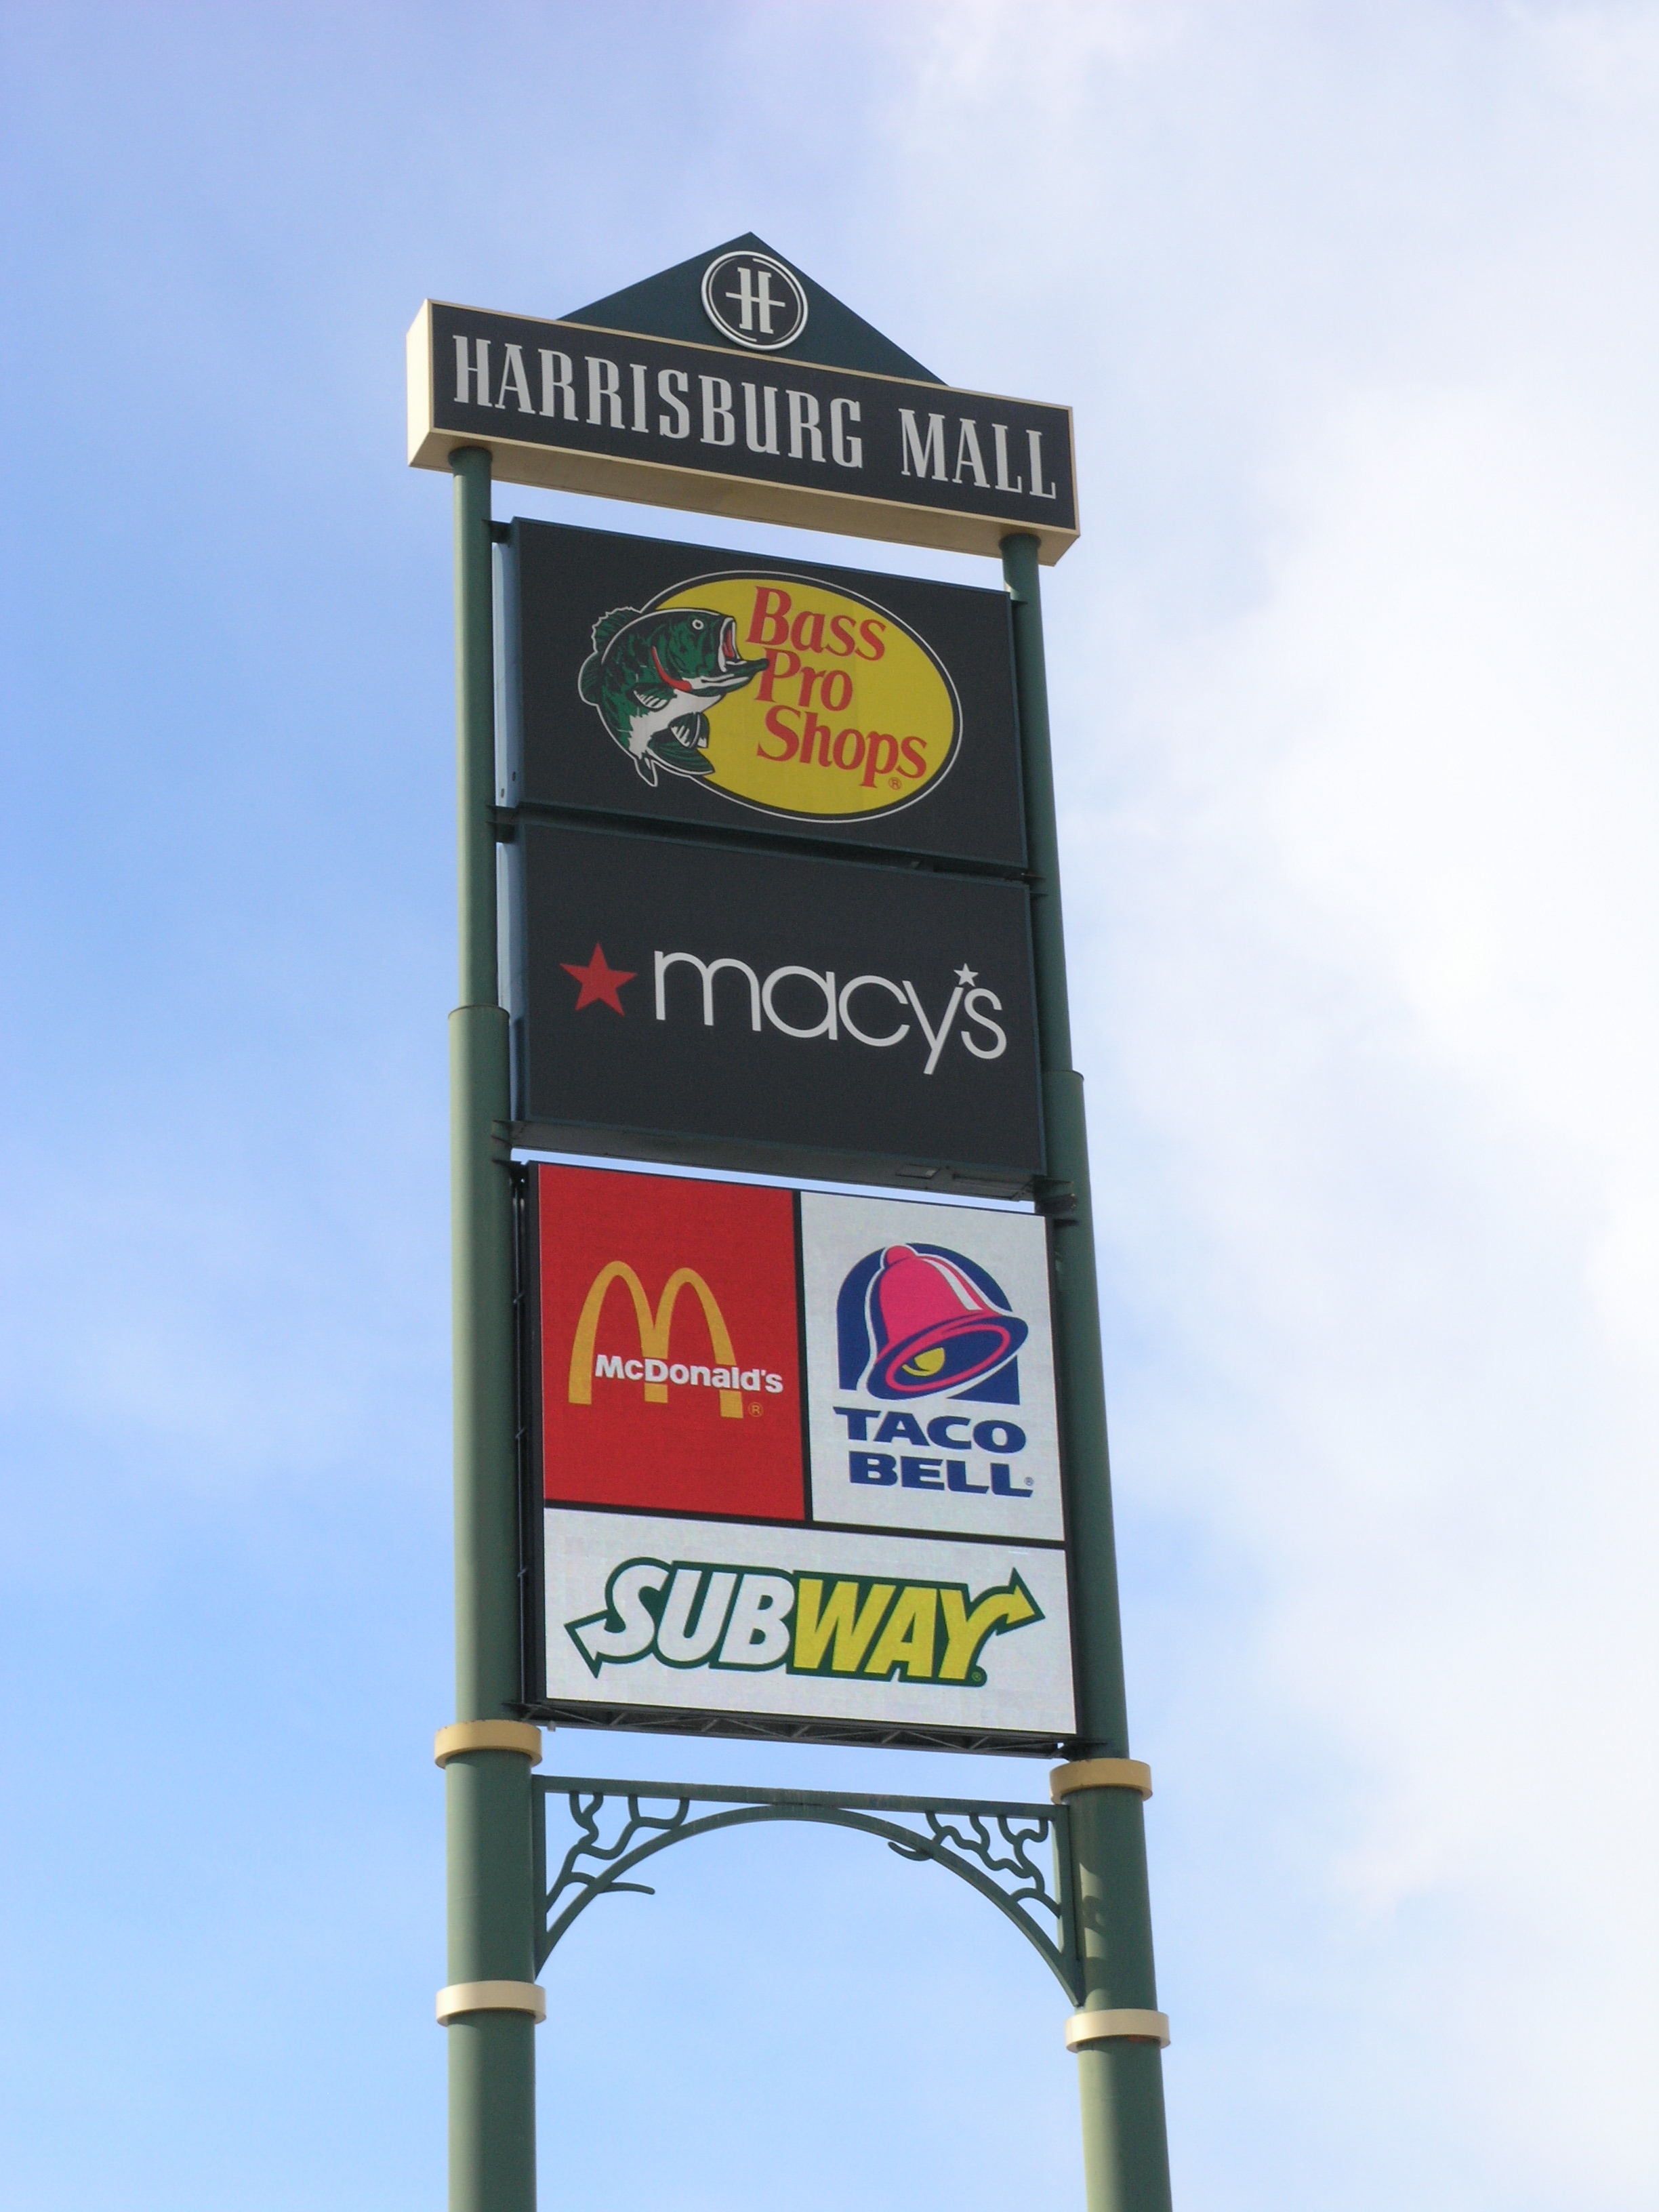 Harrisburg Mall - Pylon